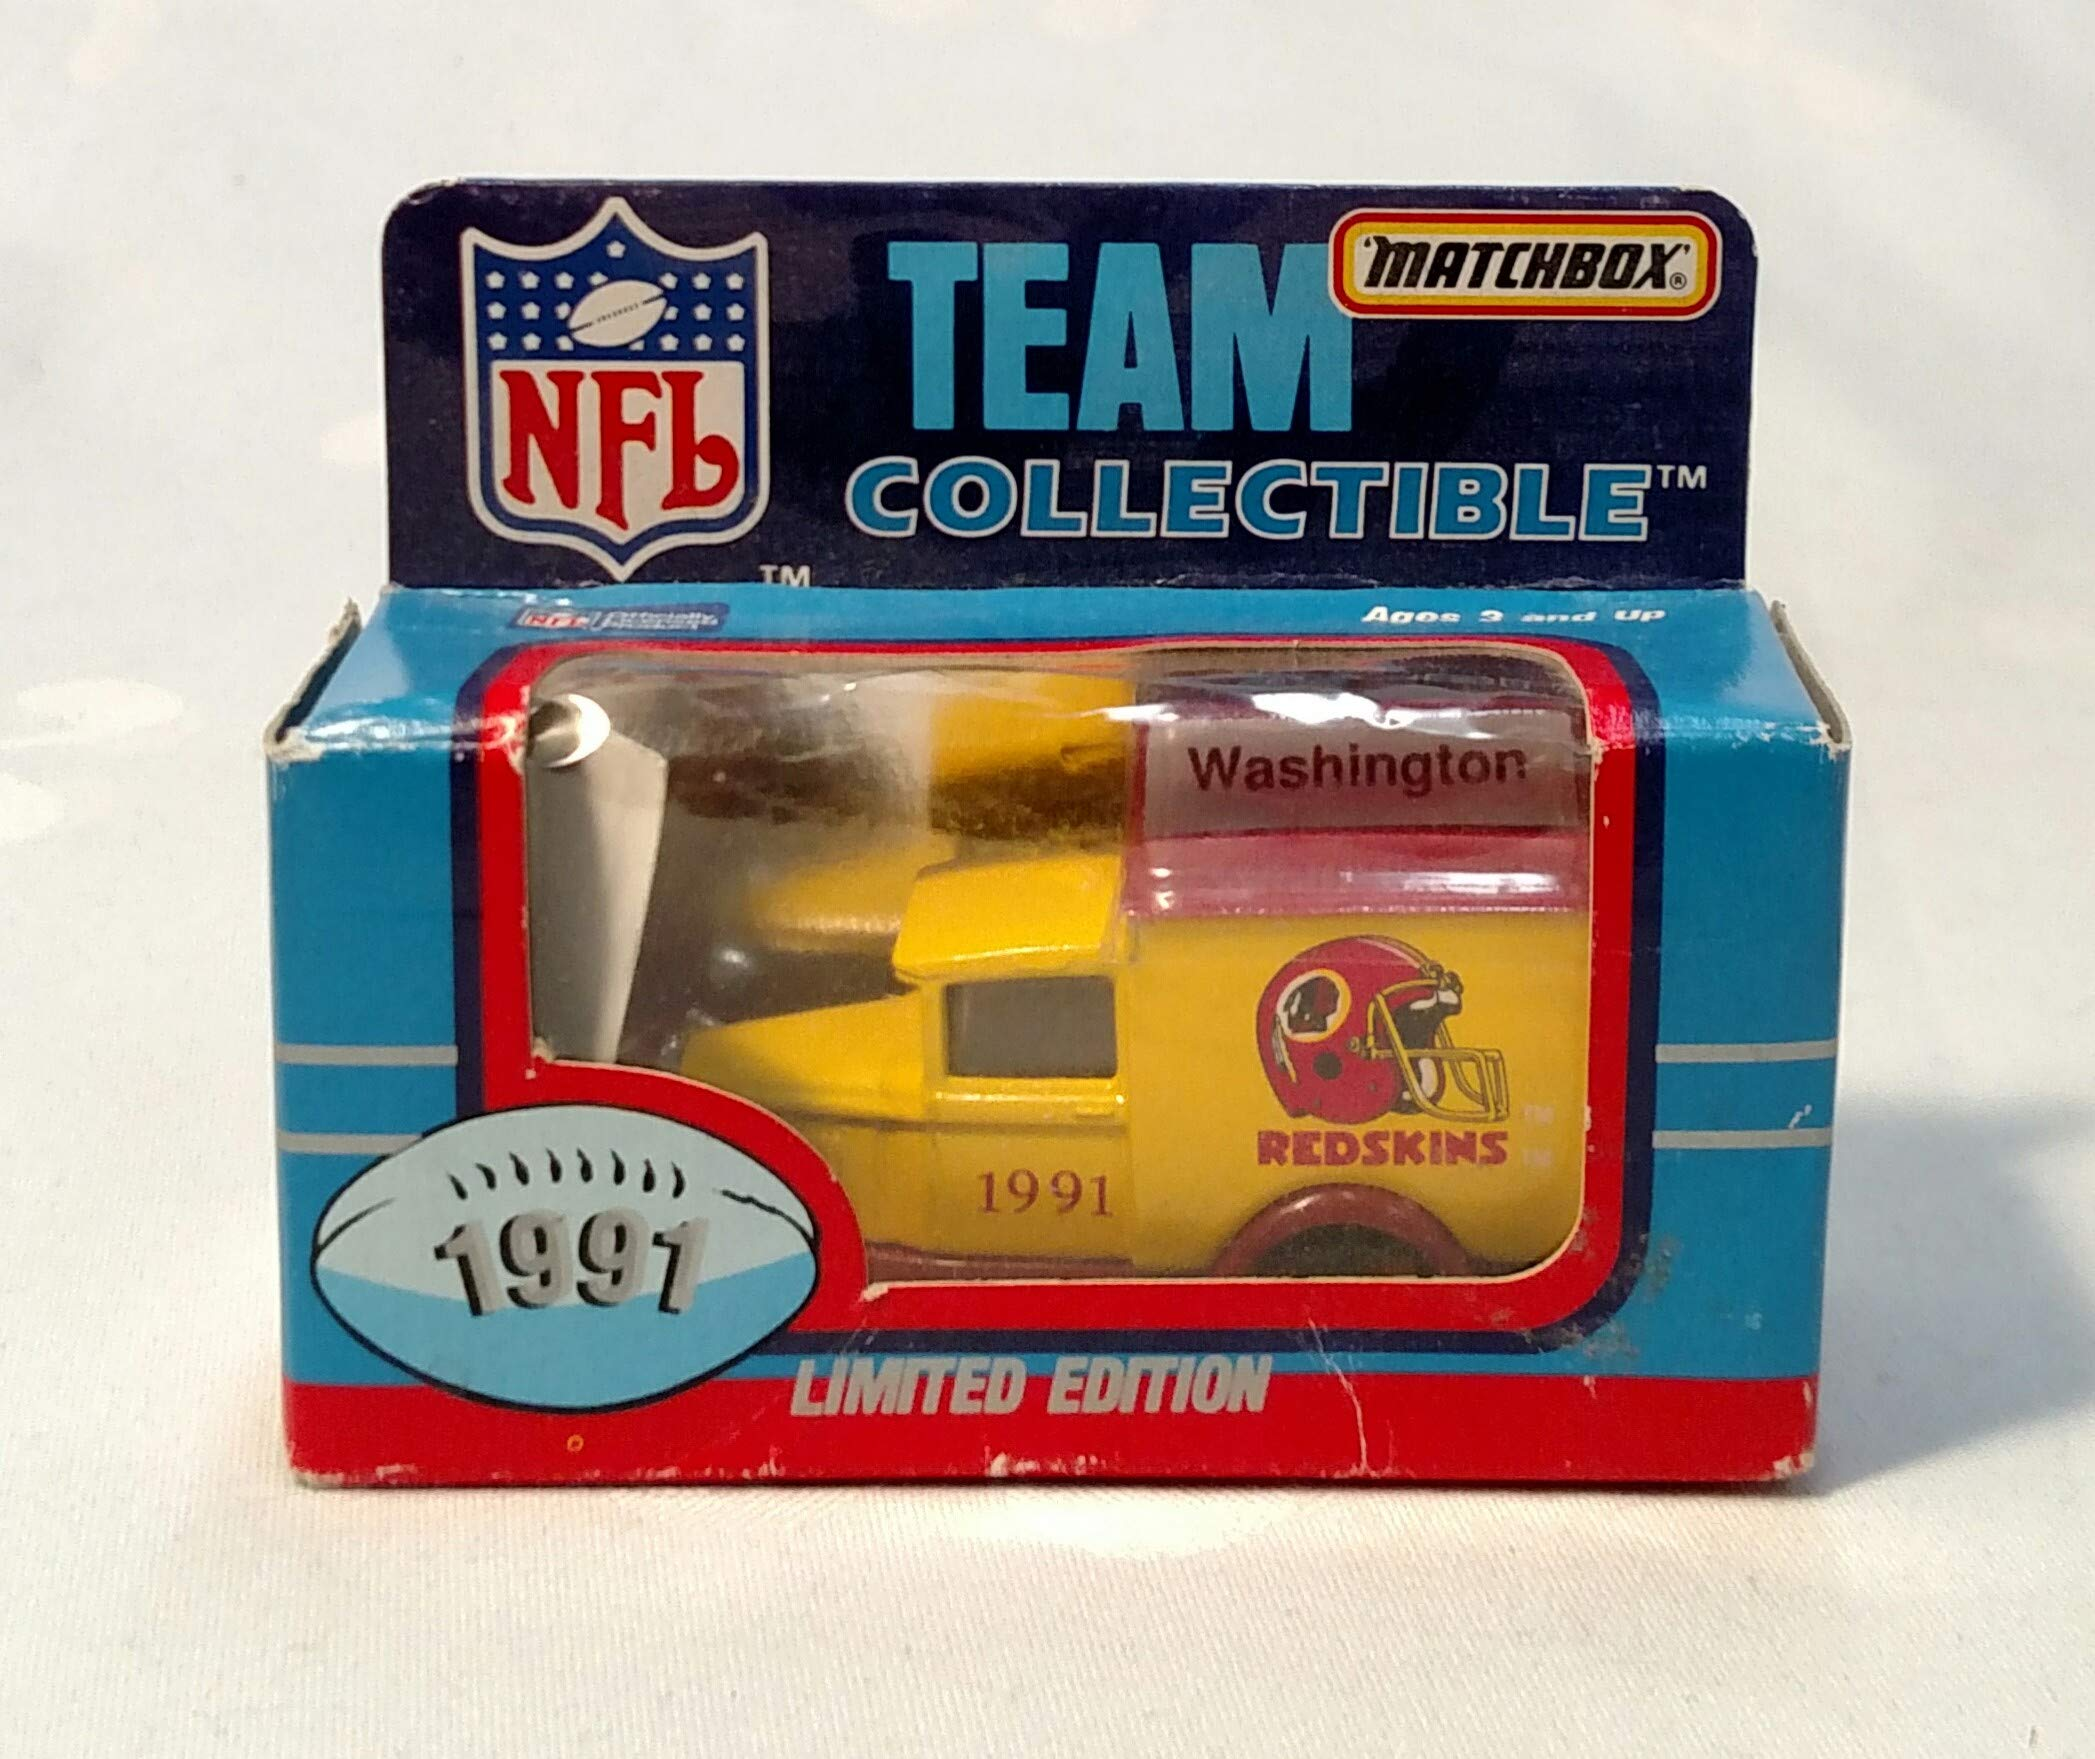 Washington Redskins 1991 Limited Edition Matchbox Die Cast Collectible